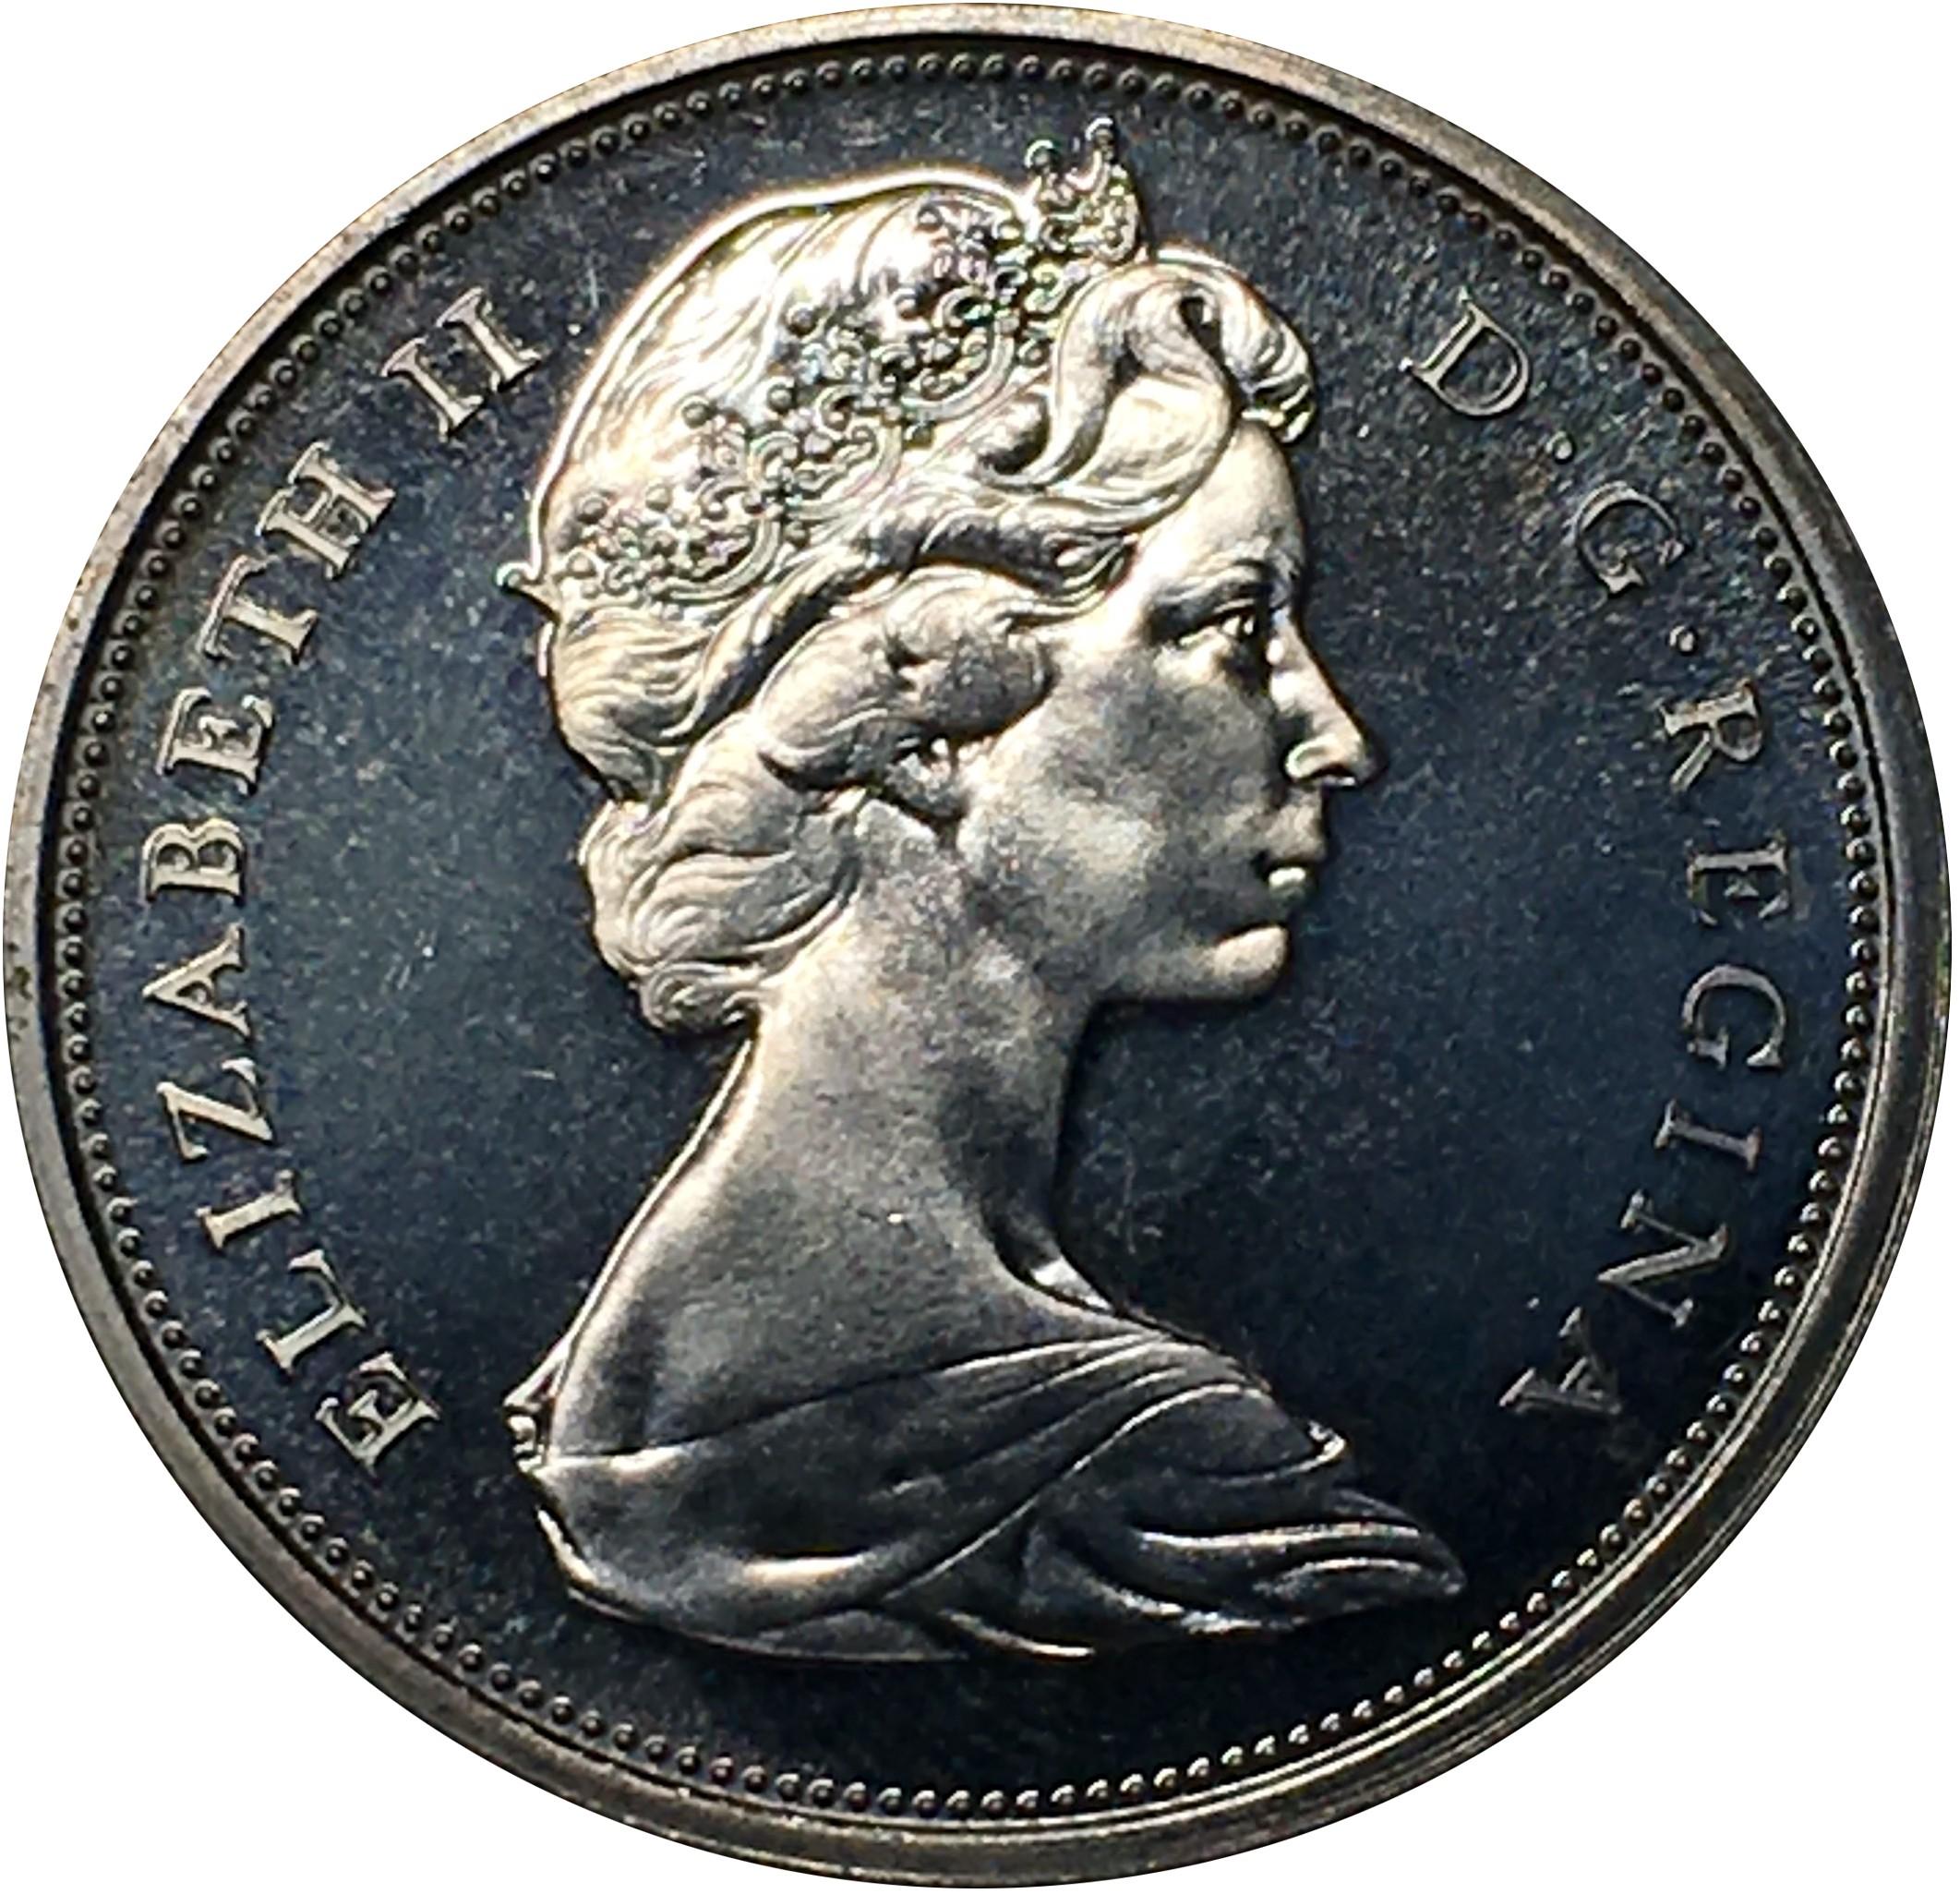 Canada 50 Cents (1967 Elizabeth II)